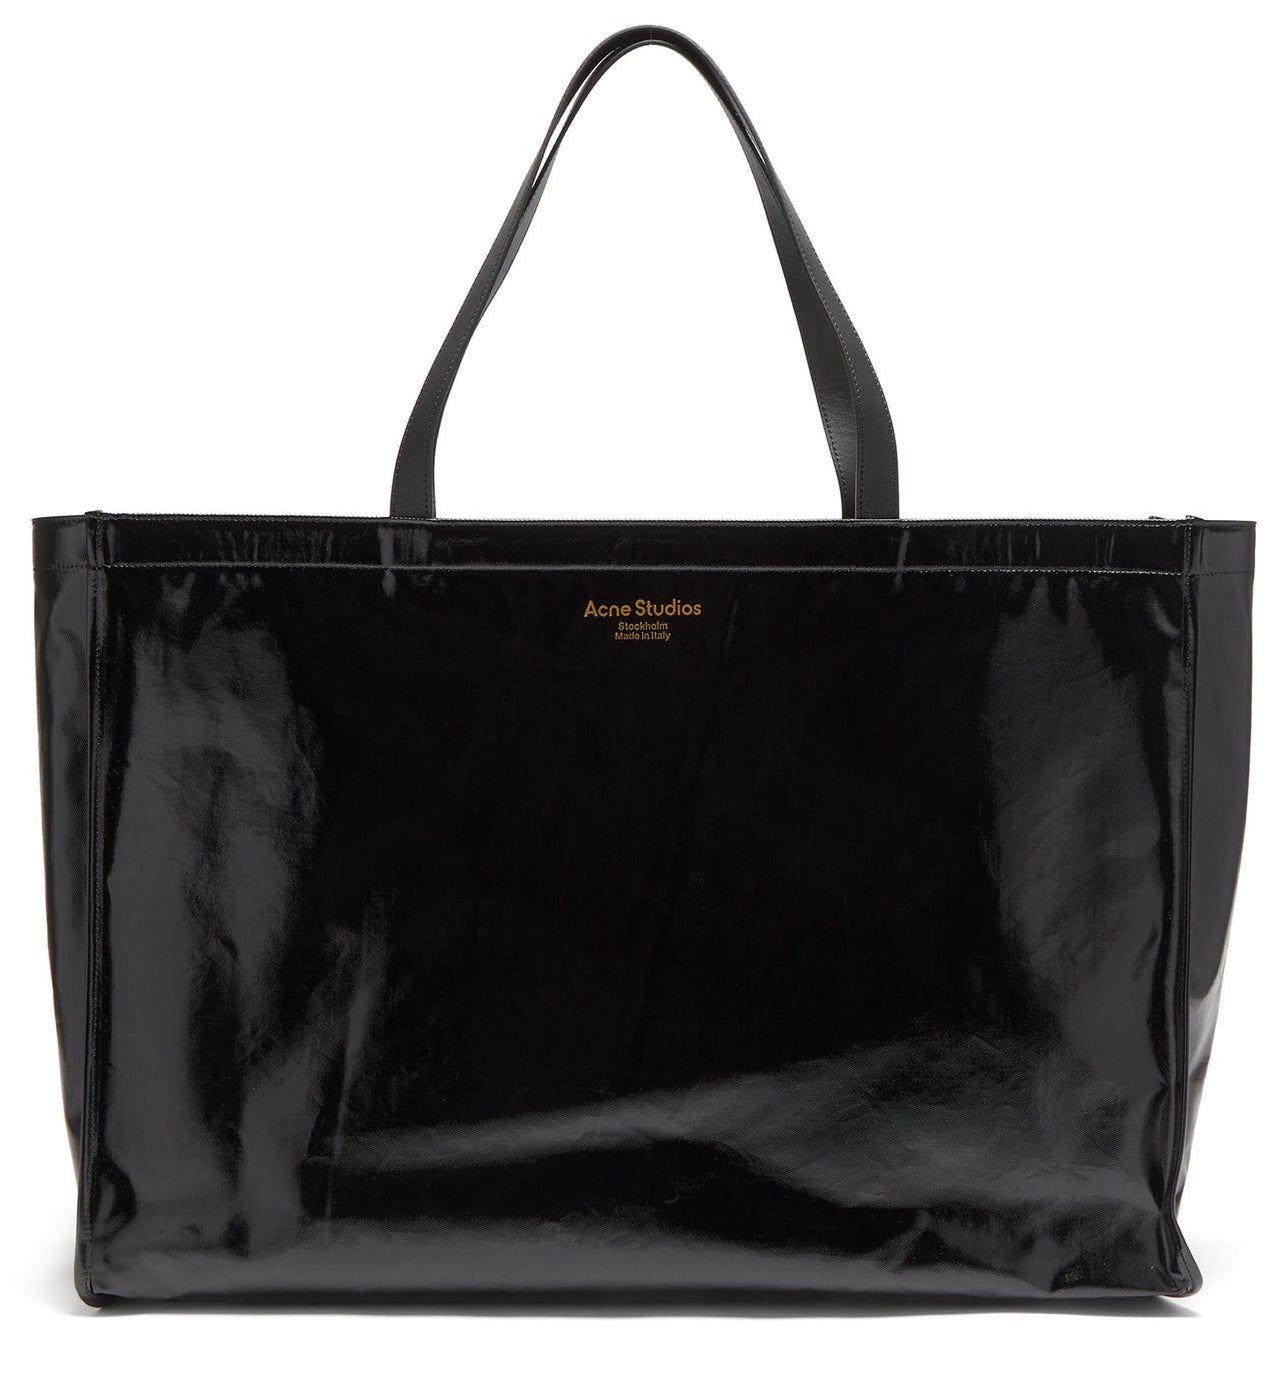 Acne Studios Agele Large Leather-Trim Coated-Canvas Tote Bag